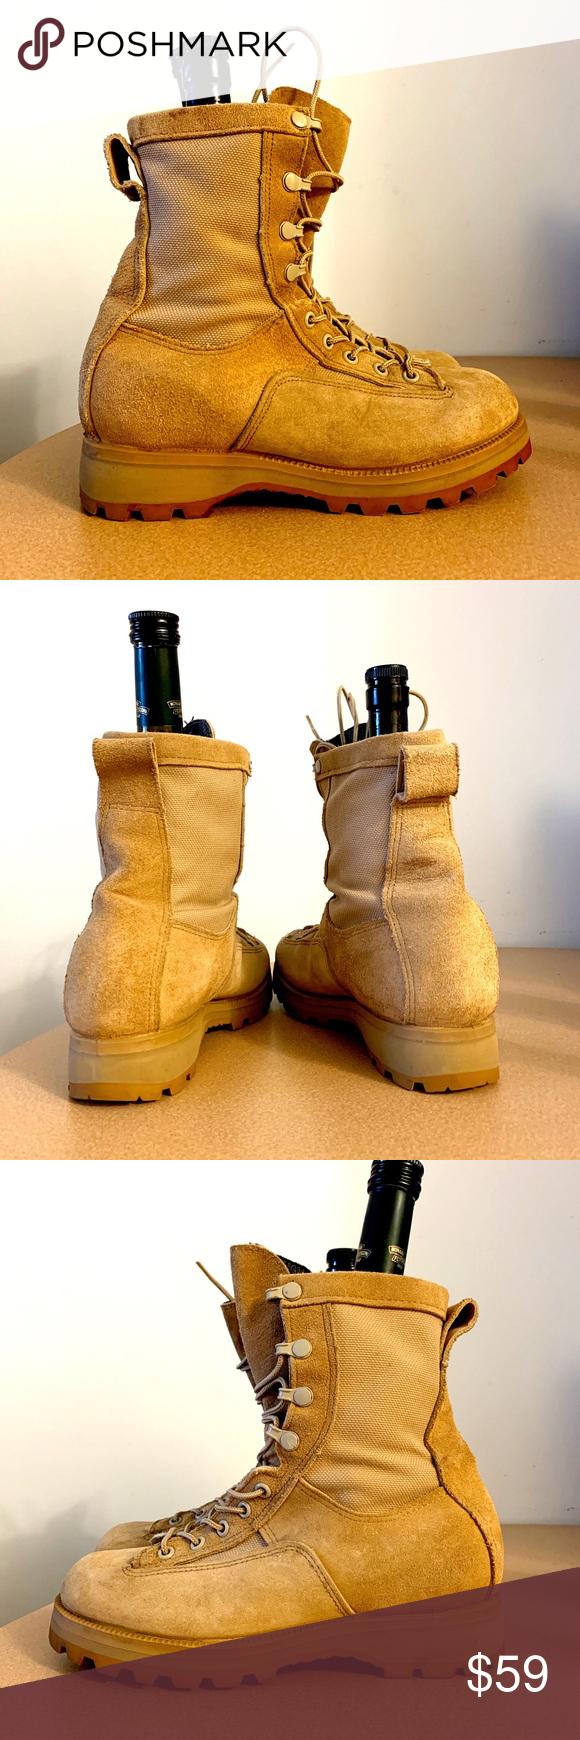 Mcrae Coyote Tan Gore Tex Military Combat Boots Combat Boots Boots Military Combat Boots